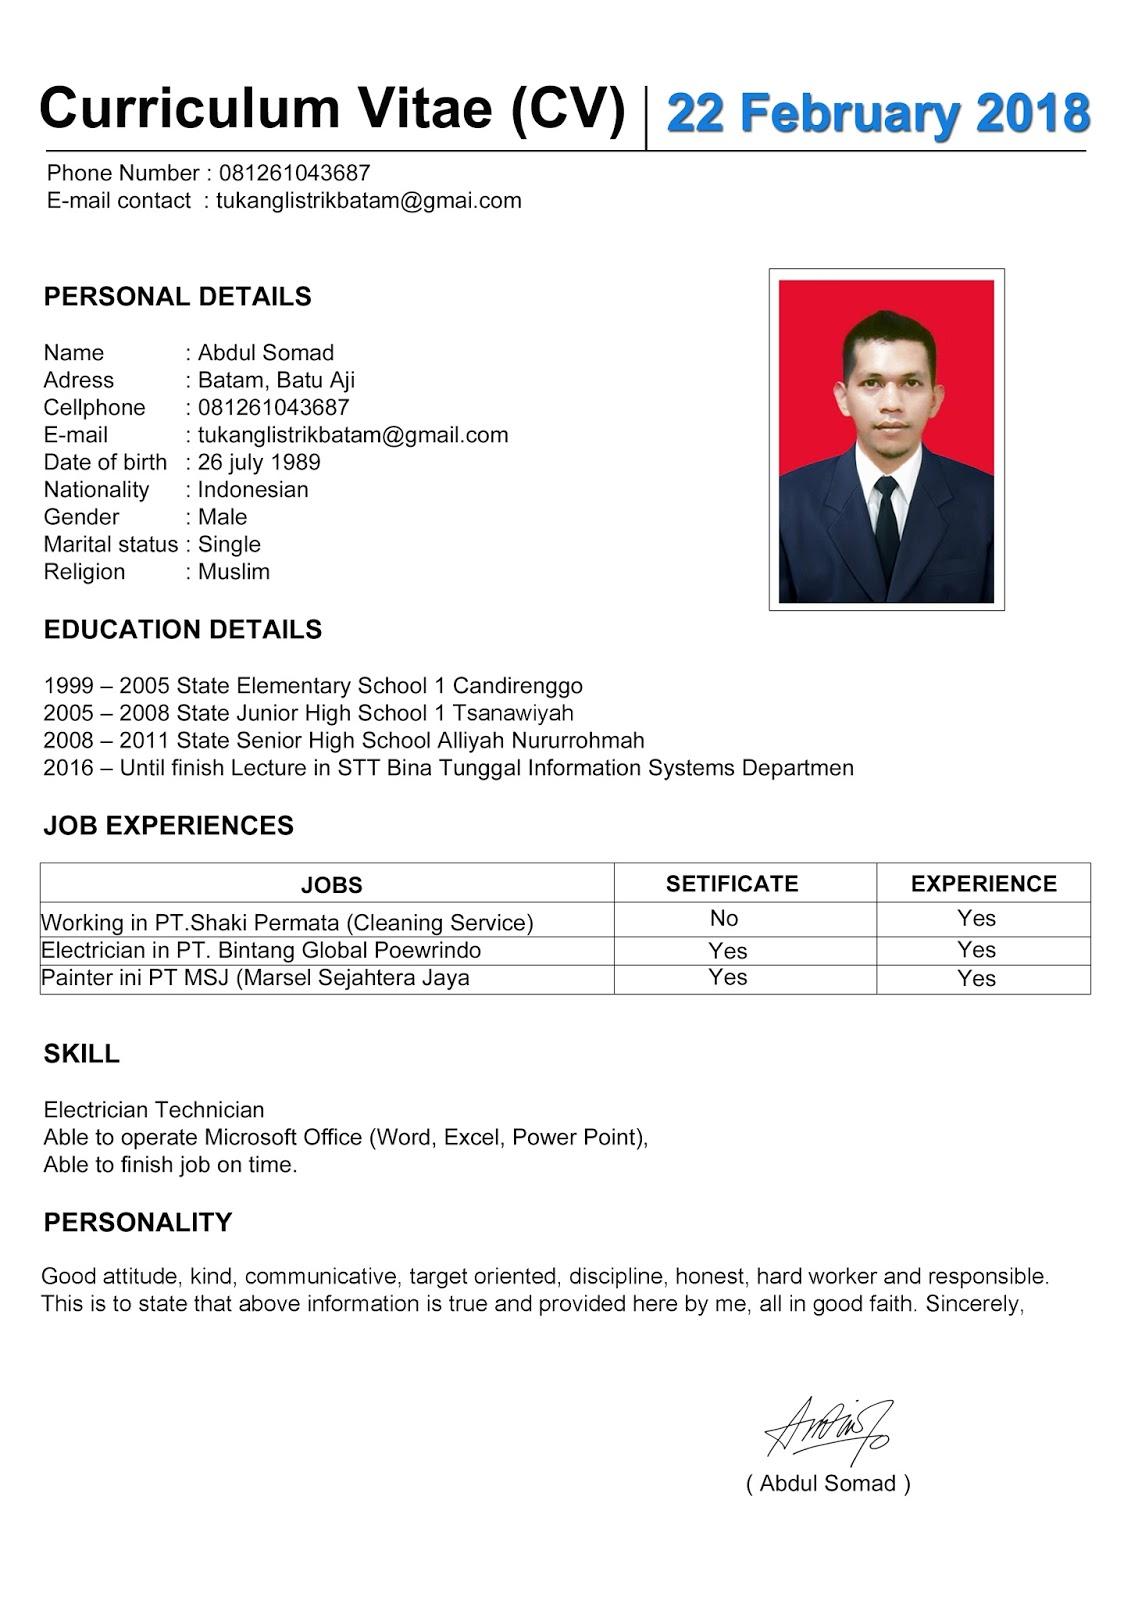 Contoh Cv Lamaran Kerja Curriculum Vitae Tukang Listrik Batam